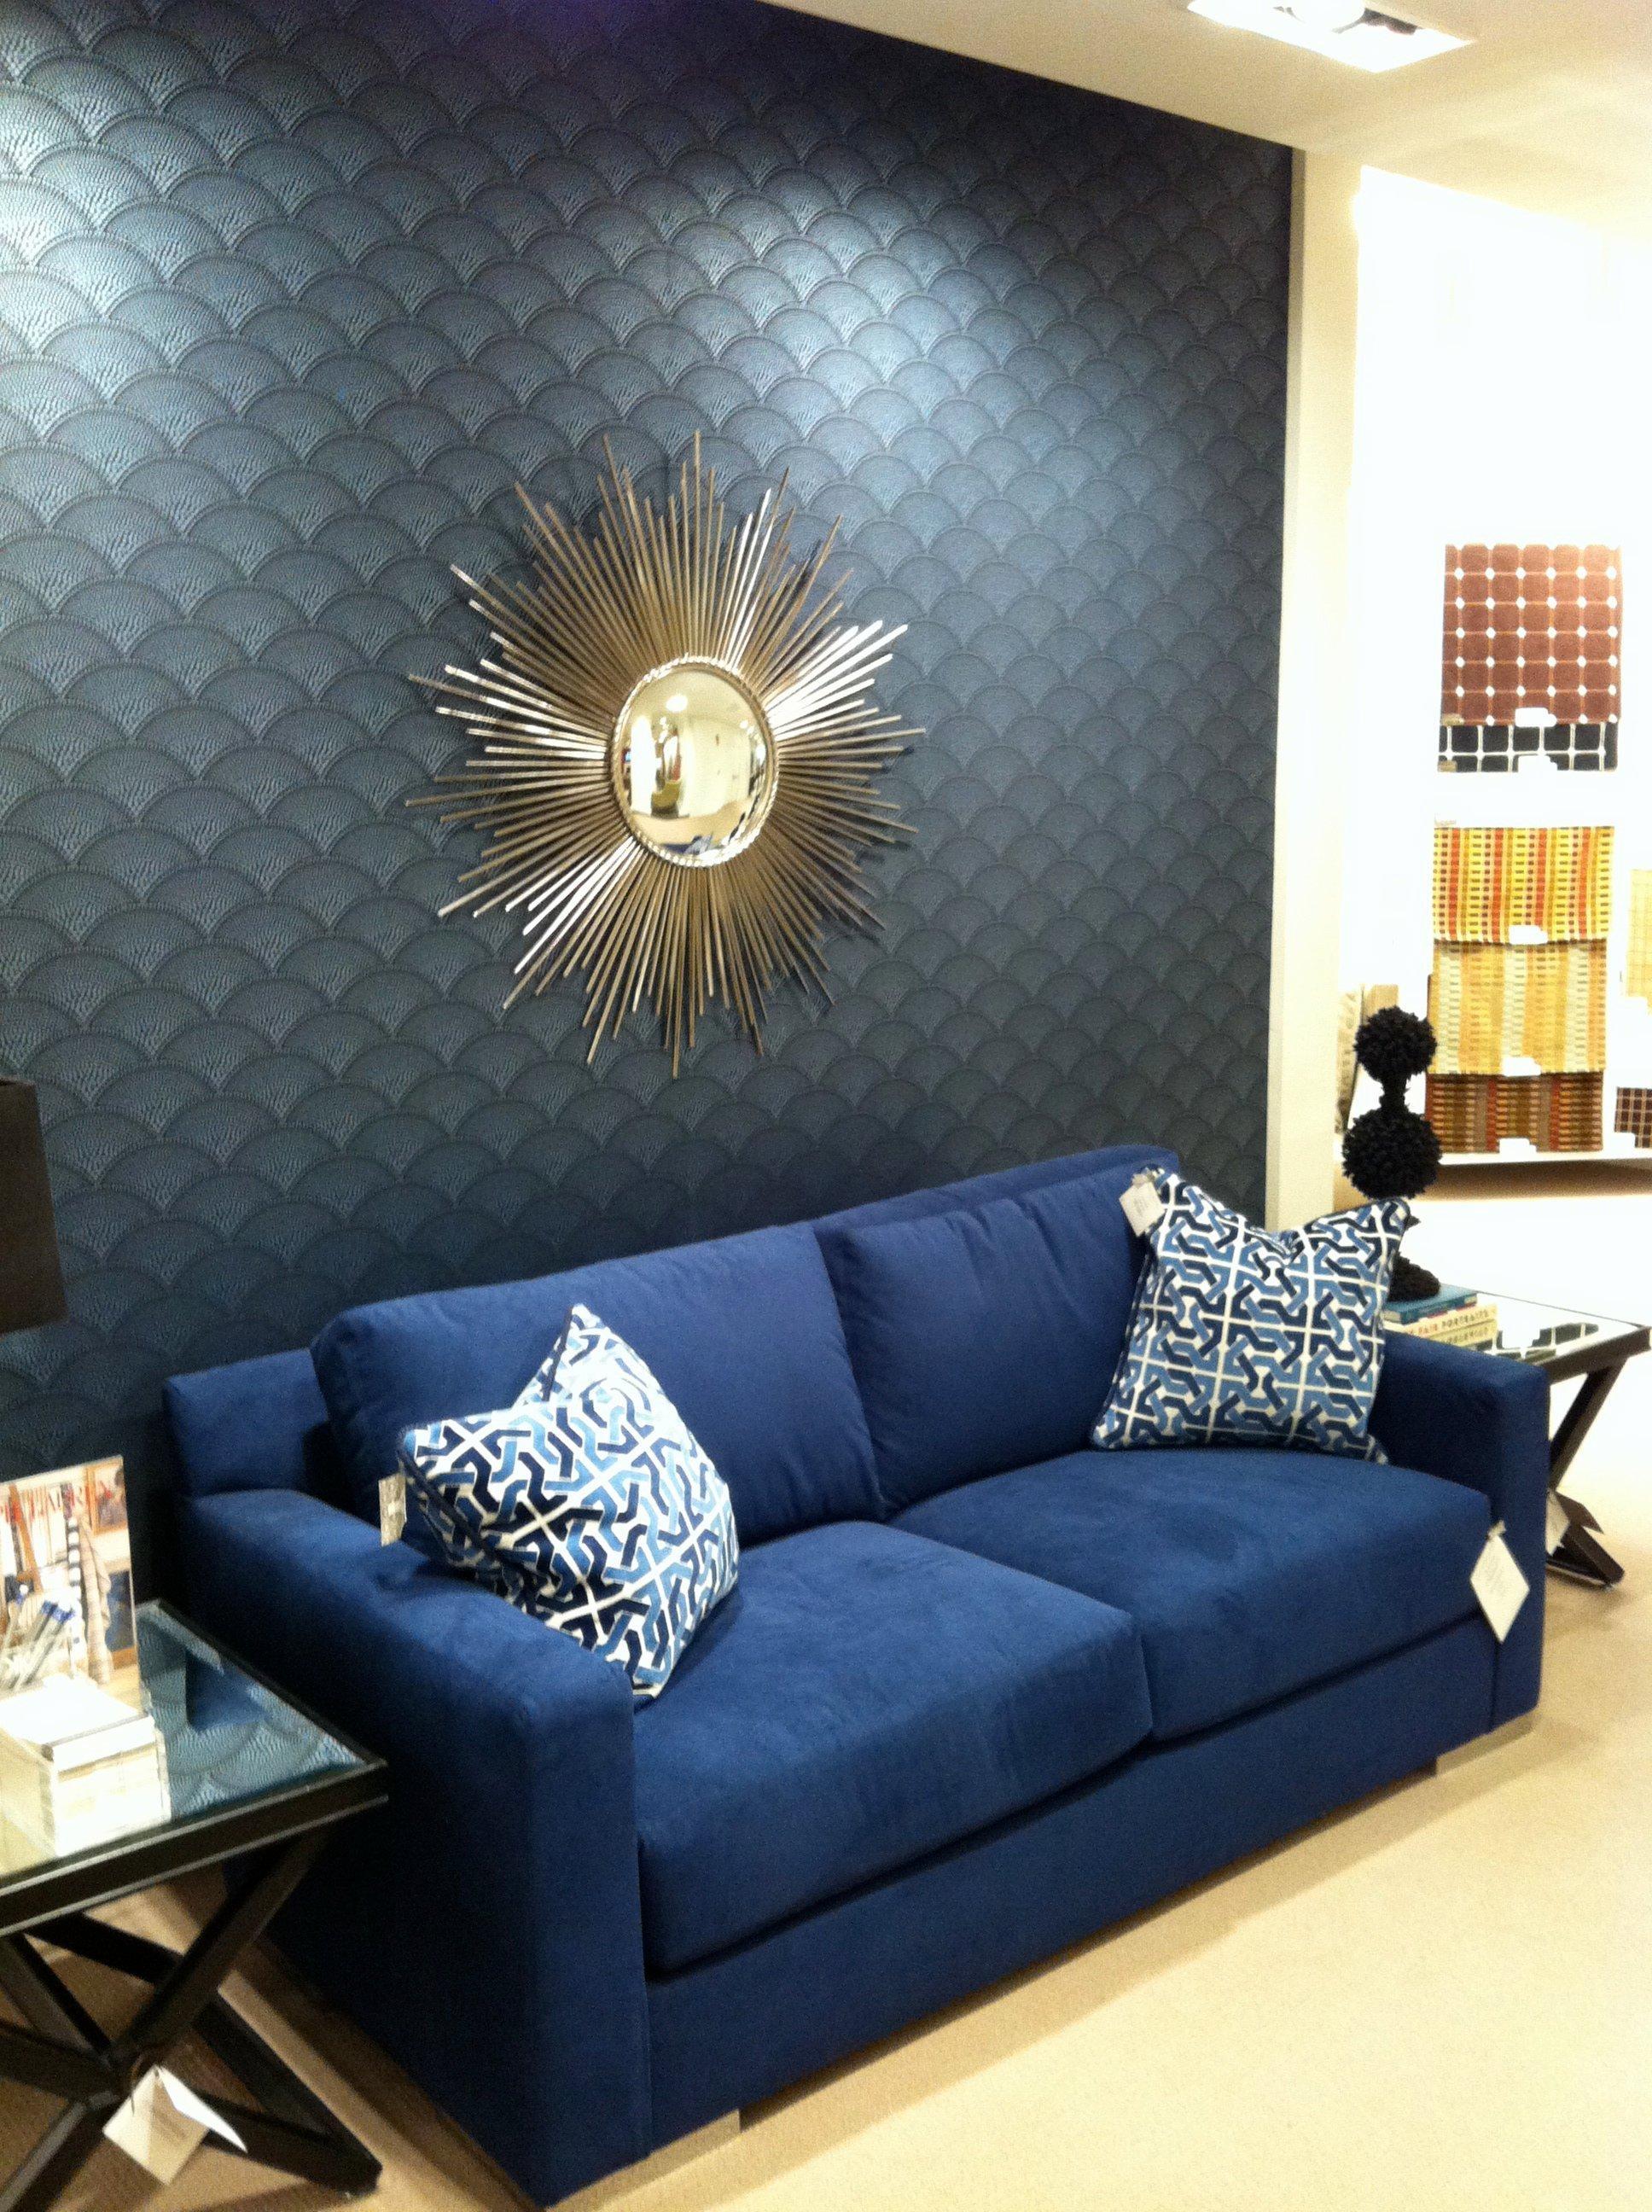 Sofas Center : Impressive Dark Blue Sofa Pictures Ideas Pinterest For Dark Blue Sofas (Image 18 of 20)